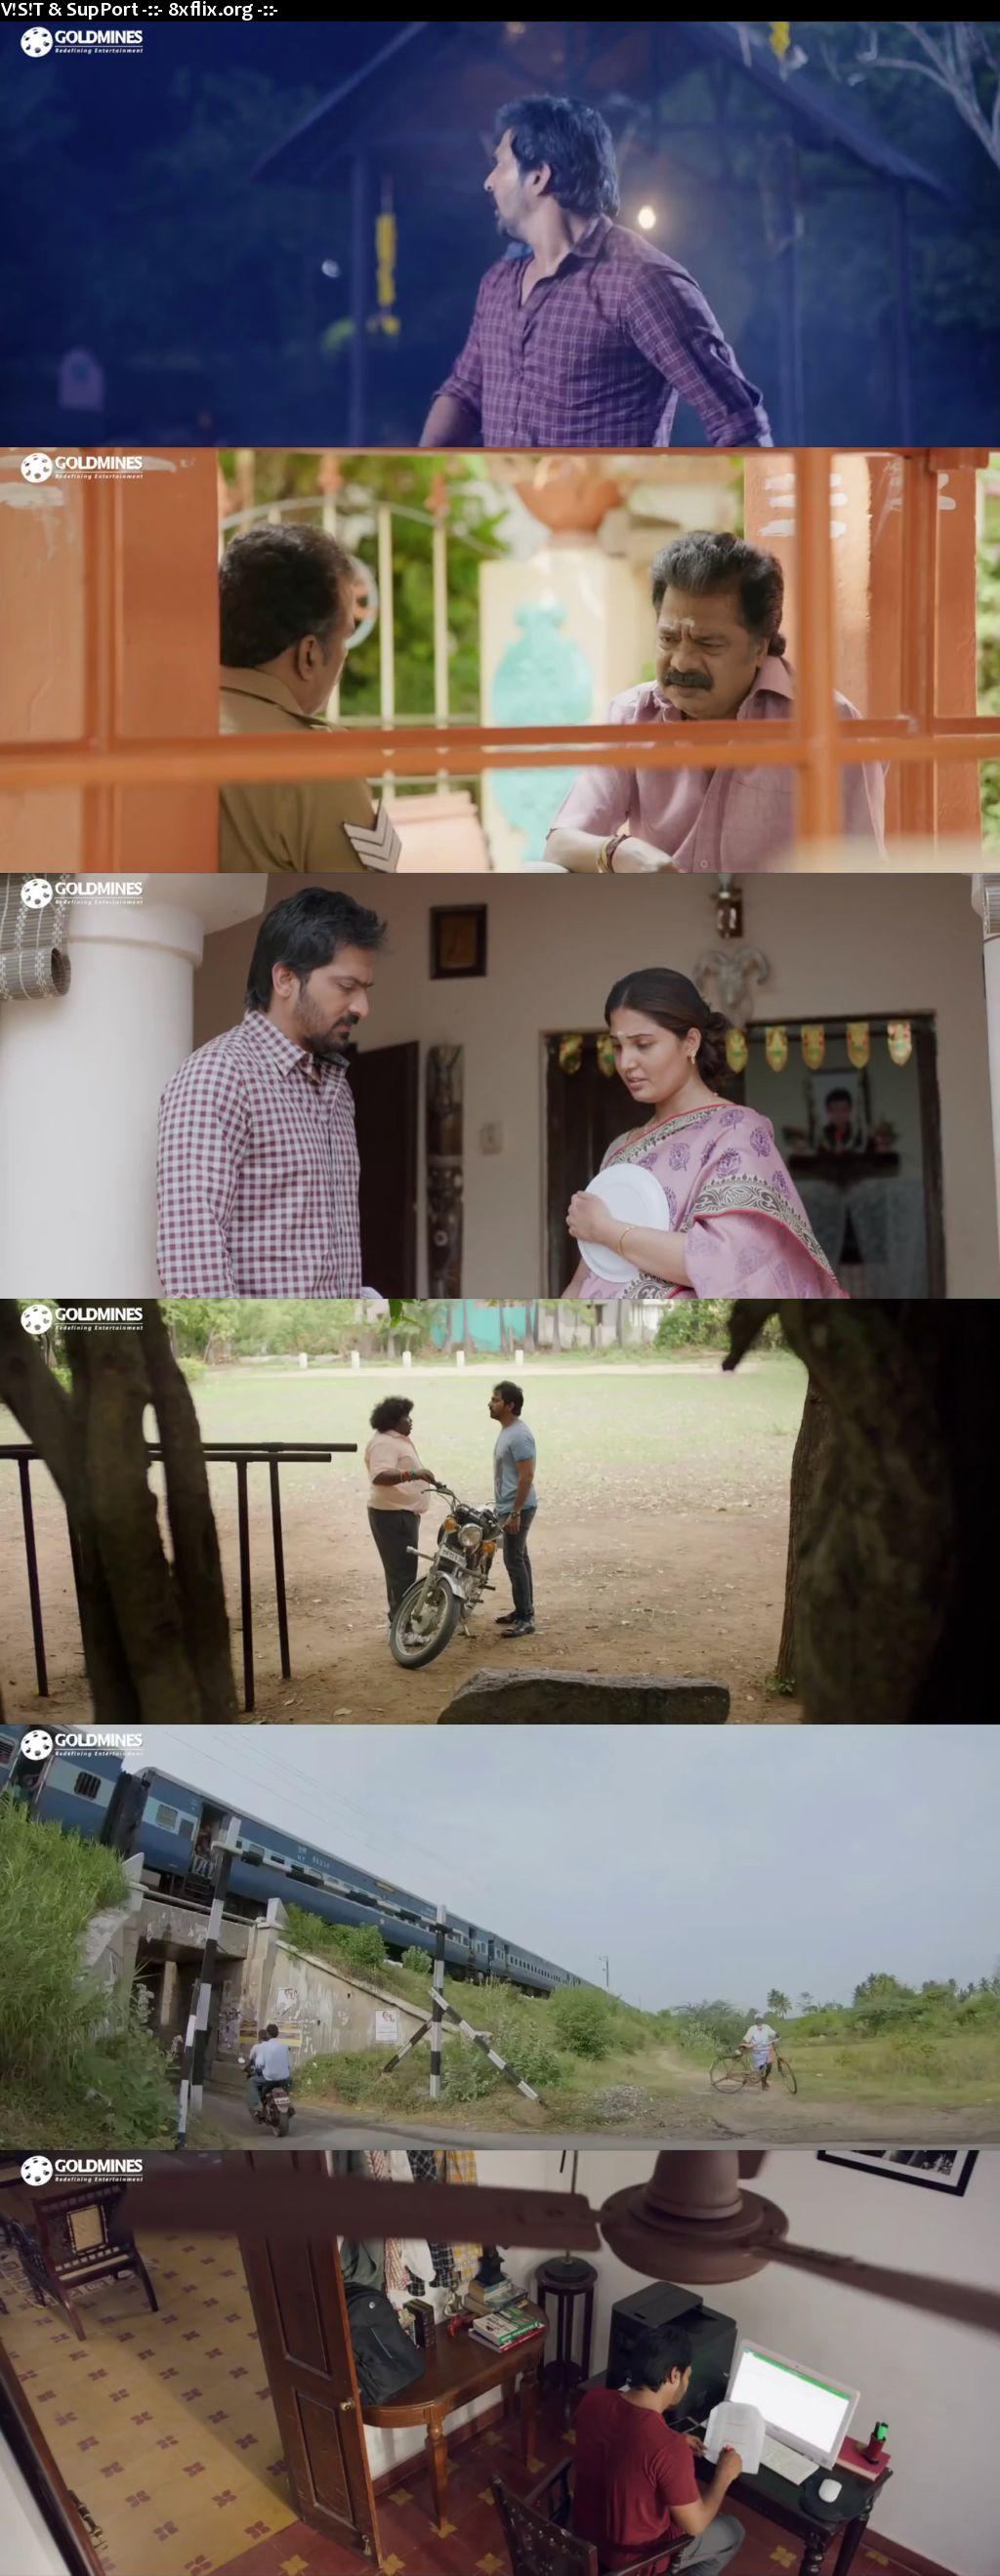 Taana 2021 Full Movie Hindi Dubbed 720p 480p HDRip